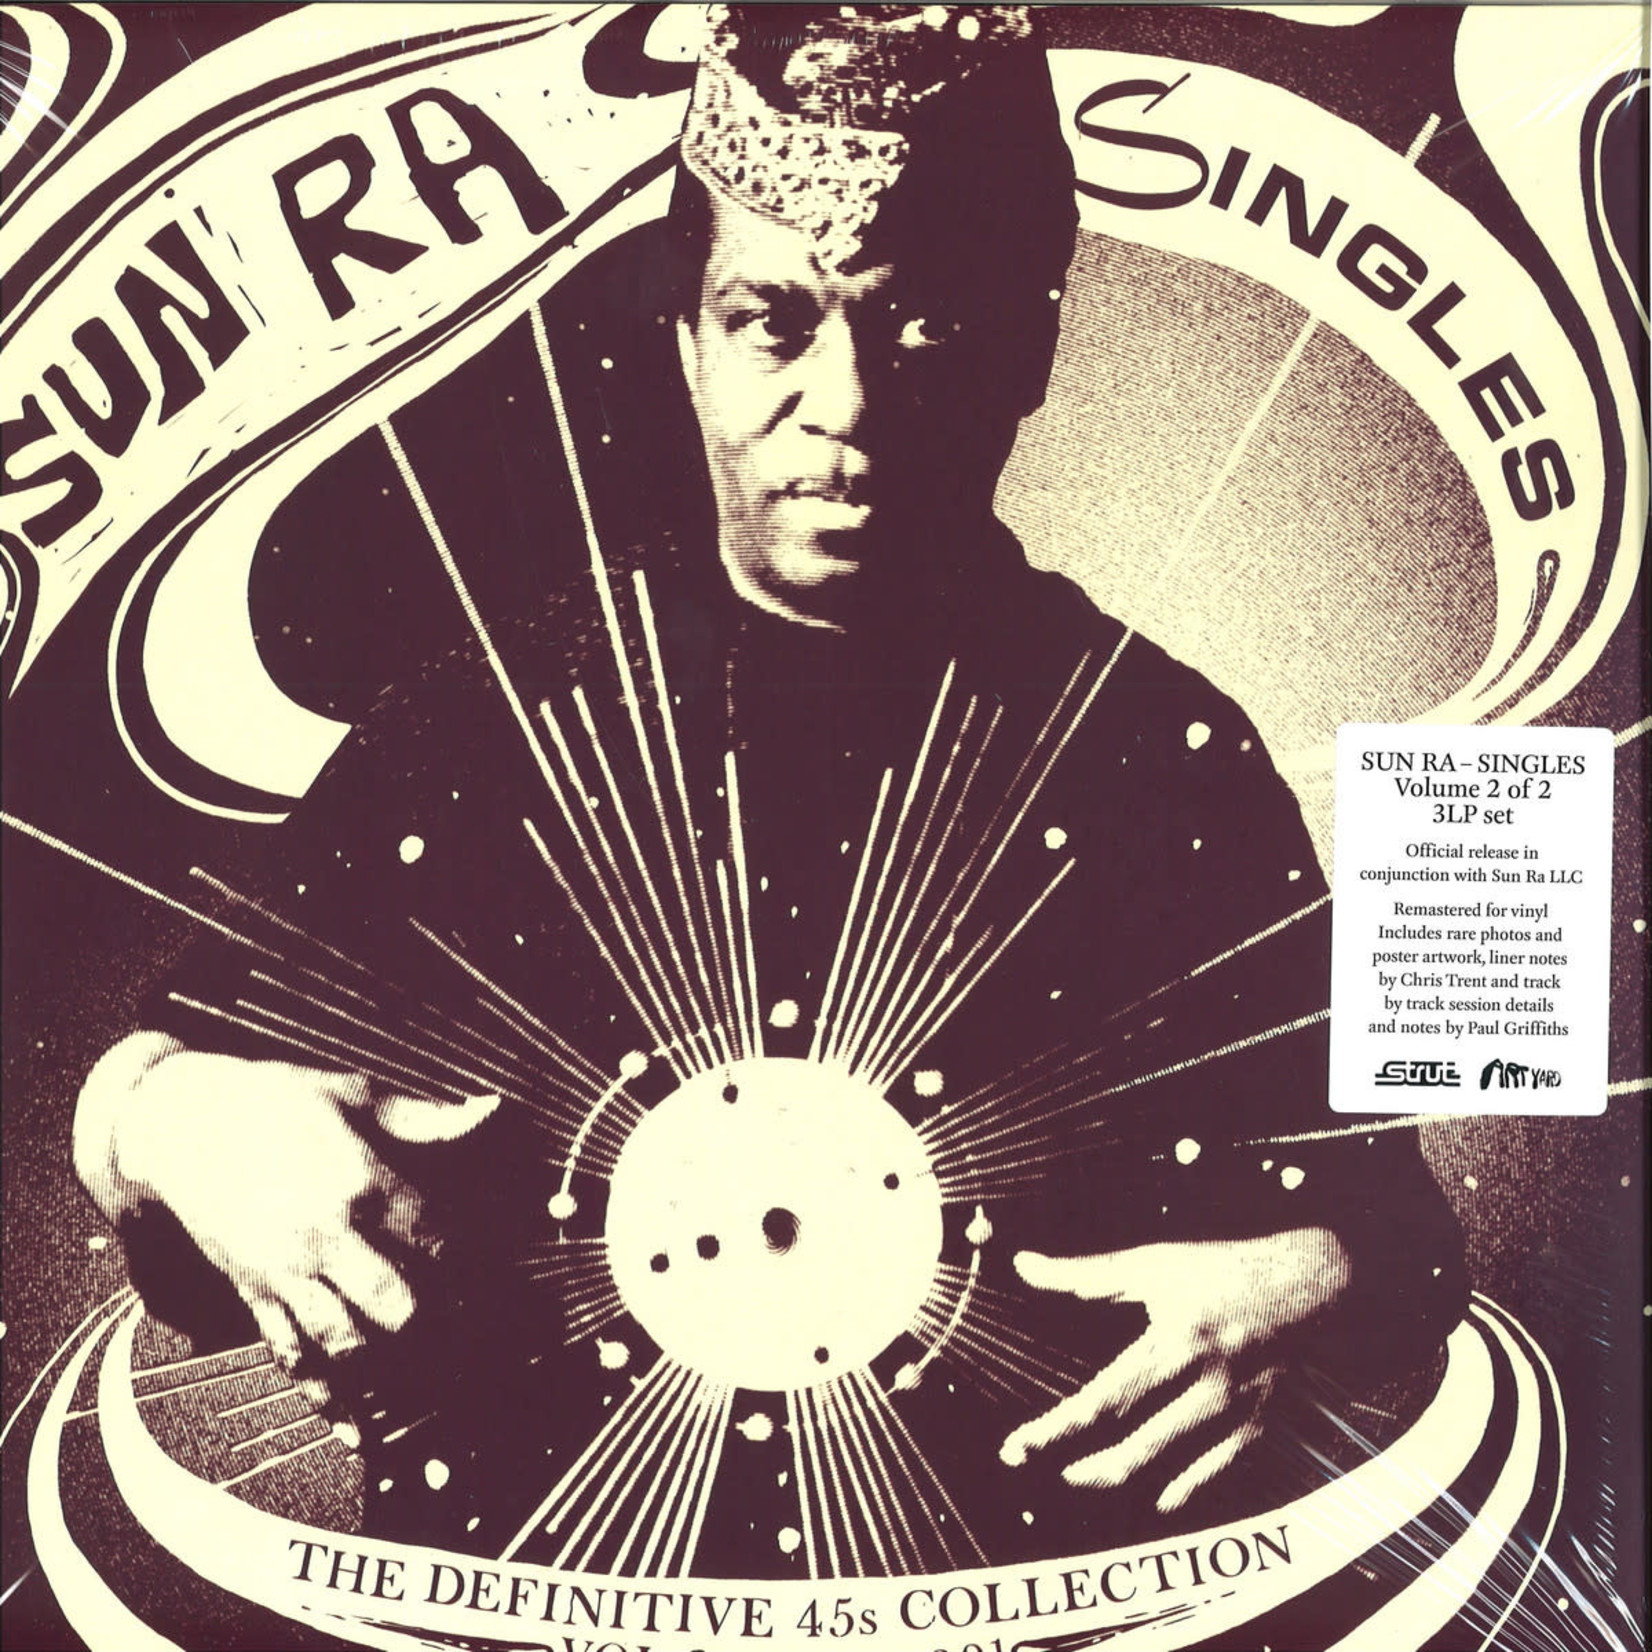 [New] Sun Ra: Singles Vol. 2 (3LP)